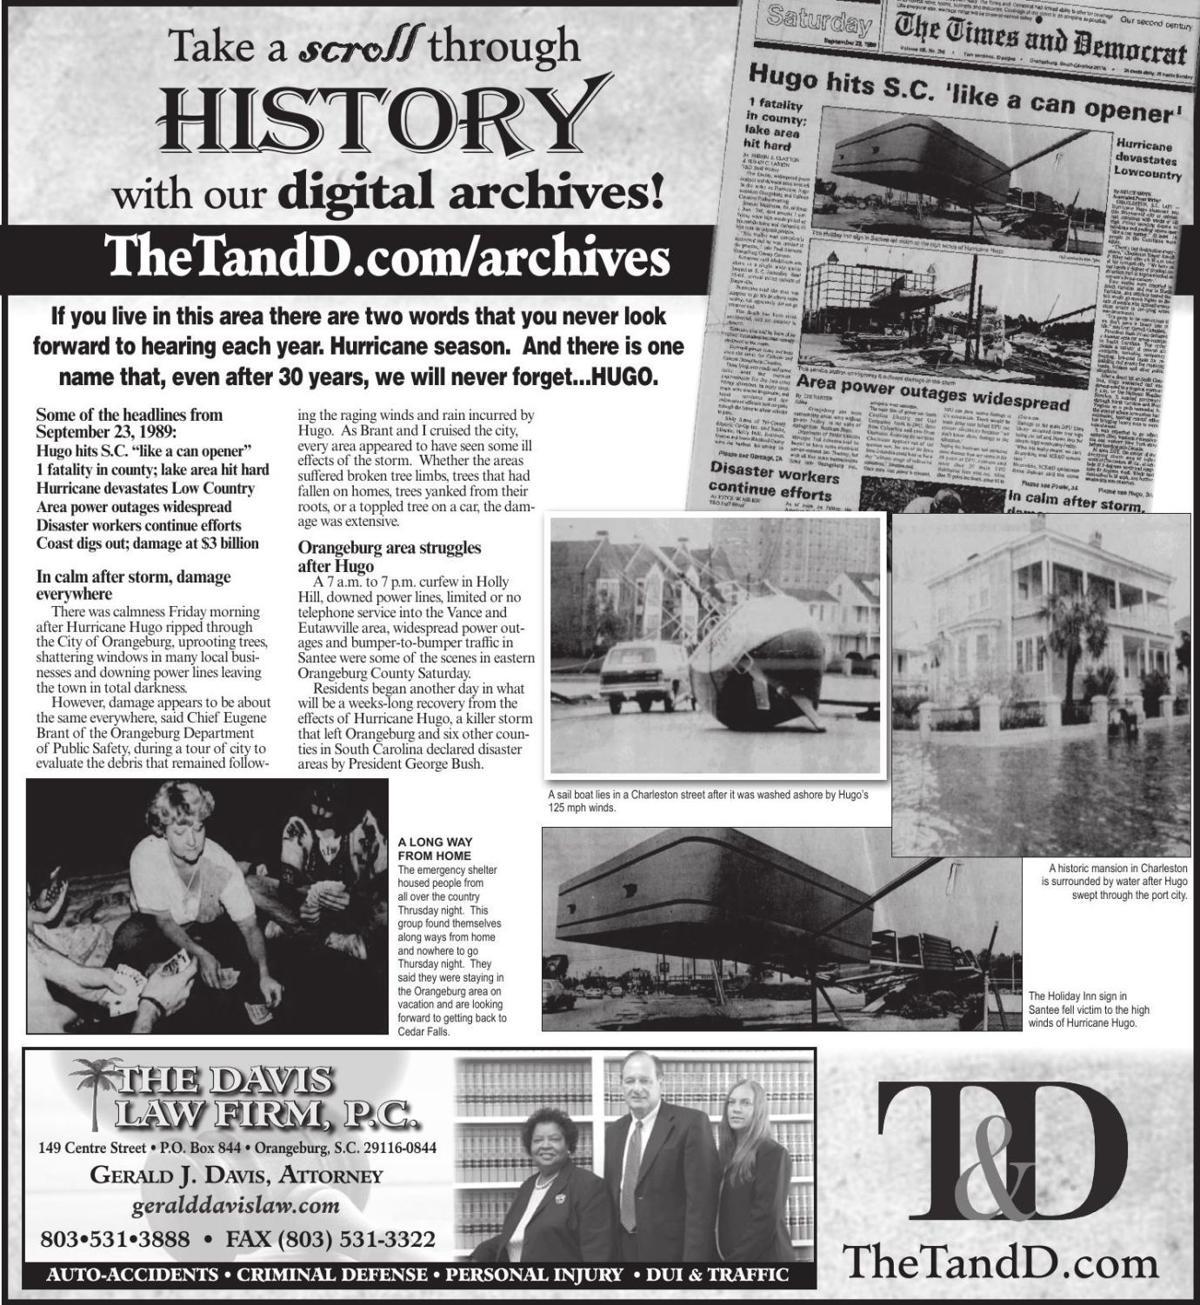 TheTandD.com/archives Sept. 22, 2019